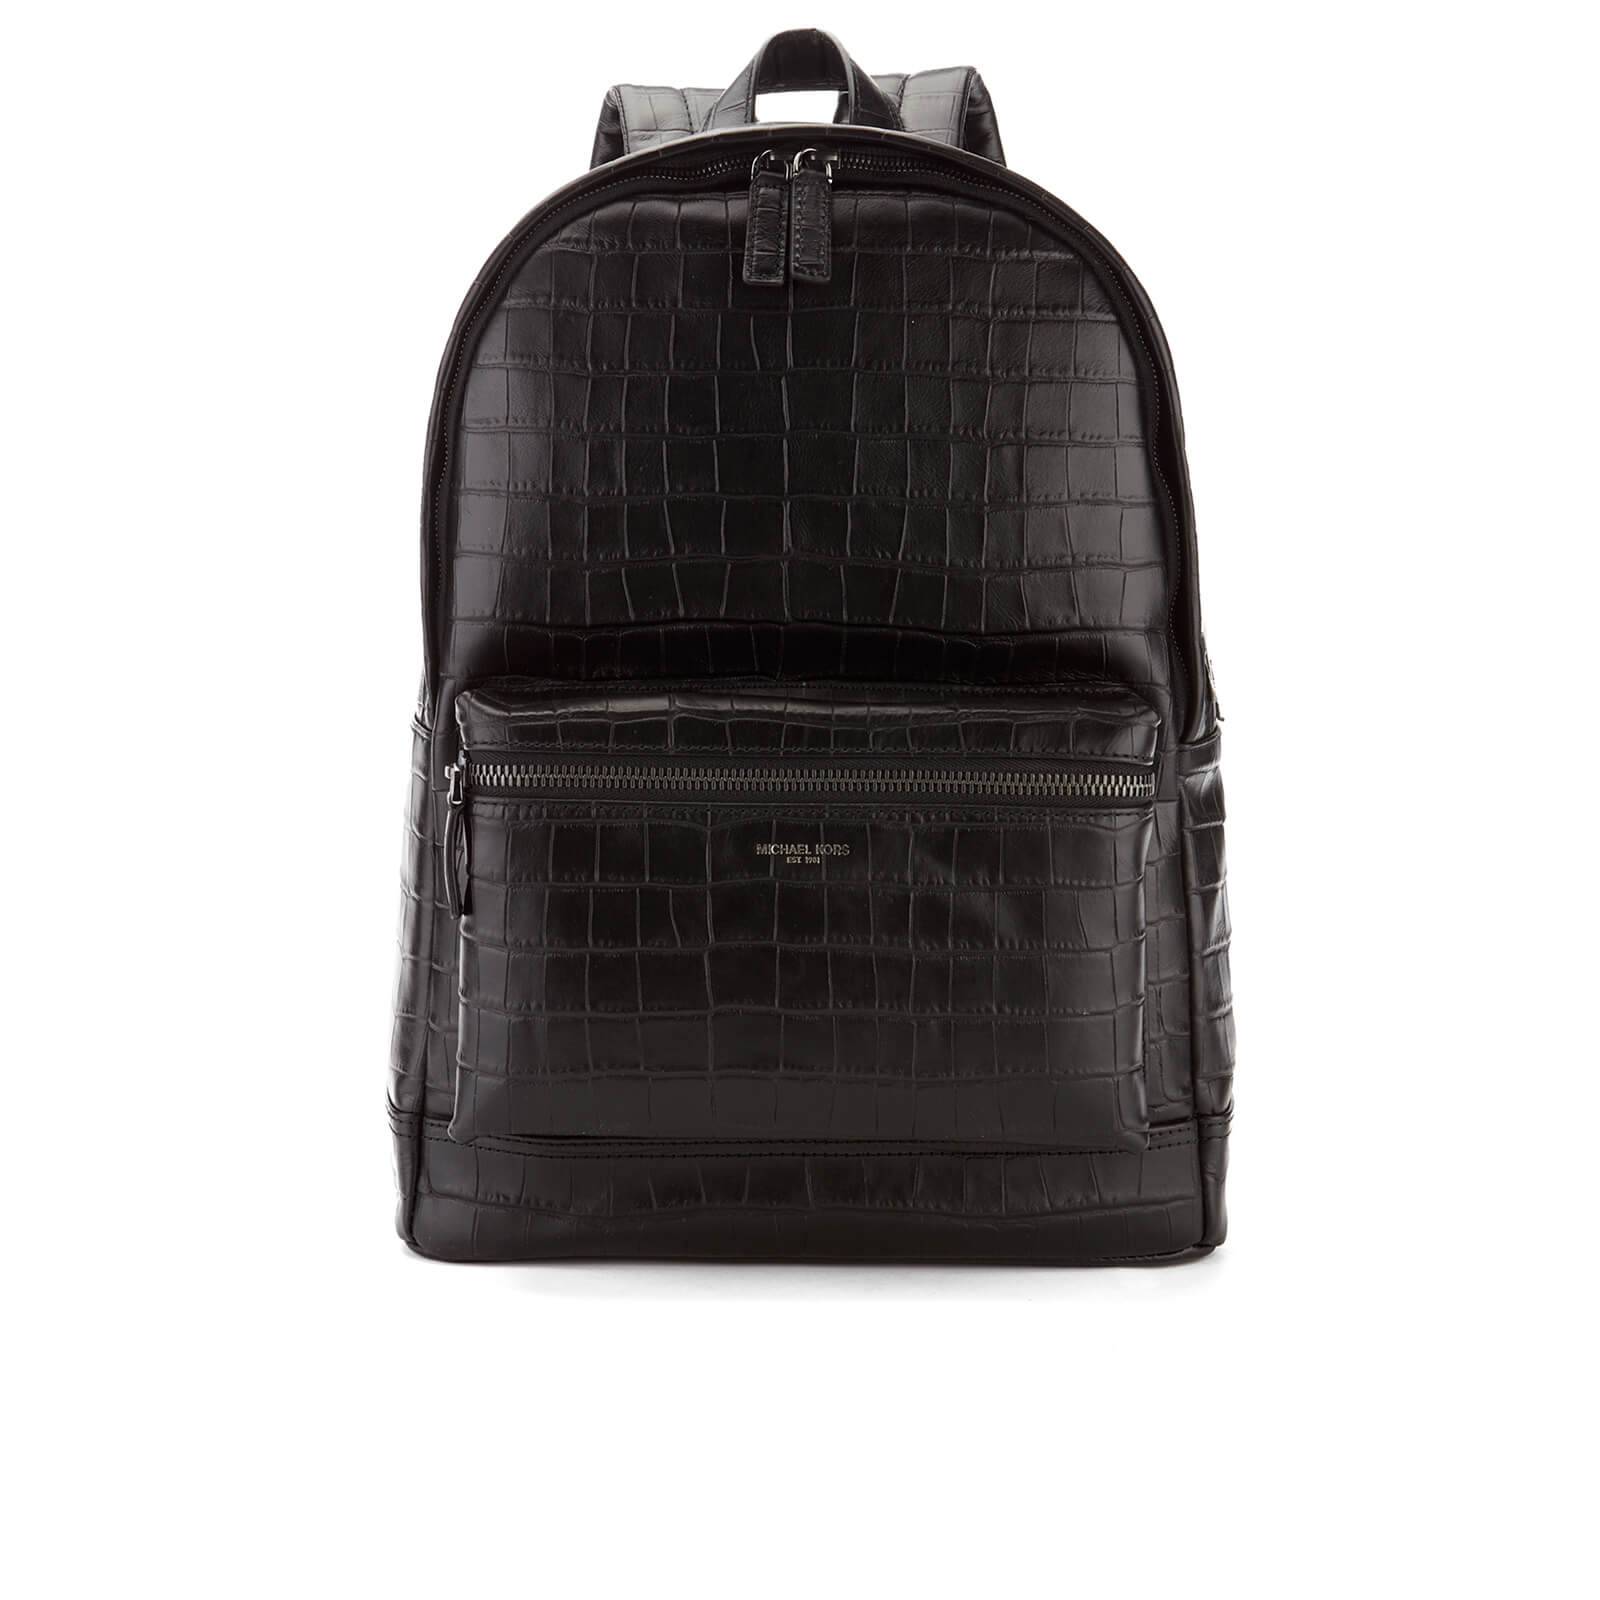 04ef0bdc57d8 Michael Kors Men s Bryant Embossed Croc Backpack - Black - Free UK ...